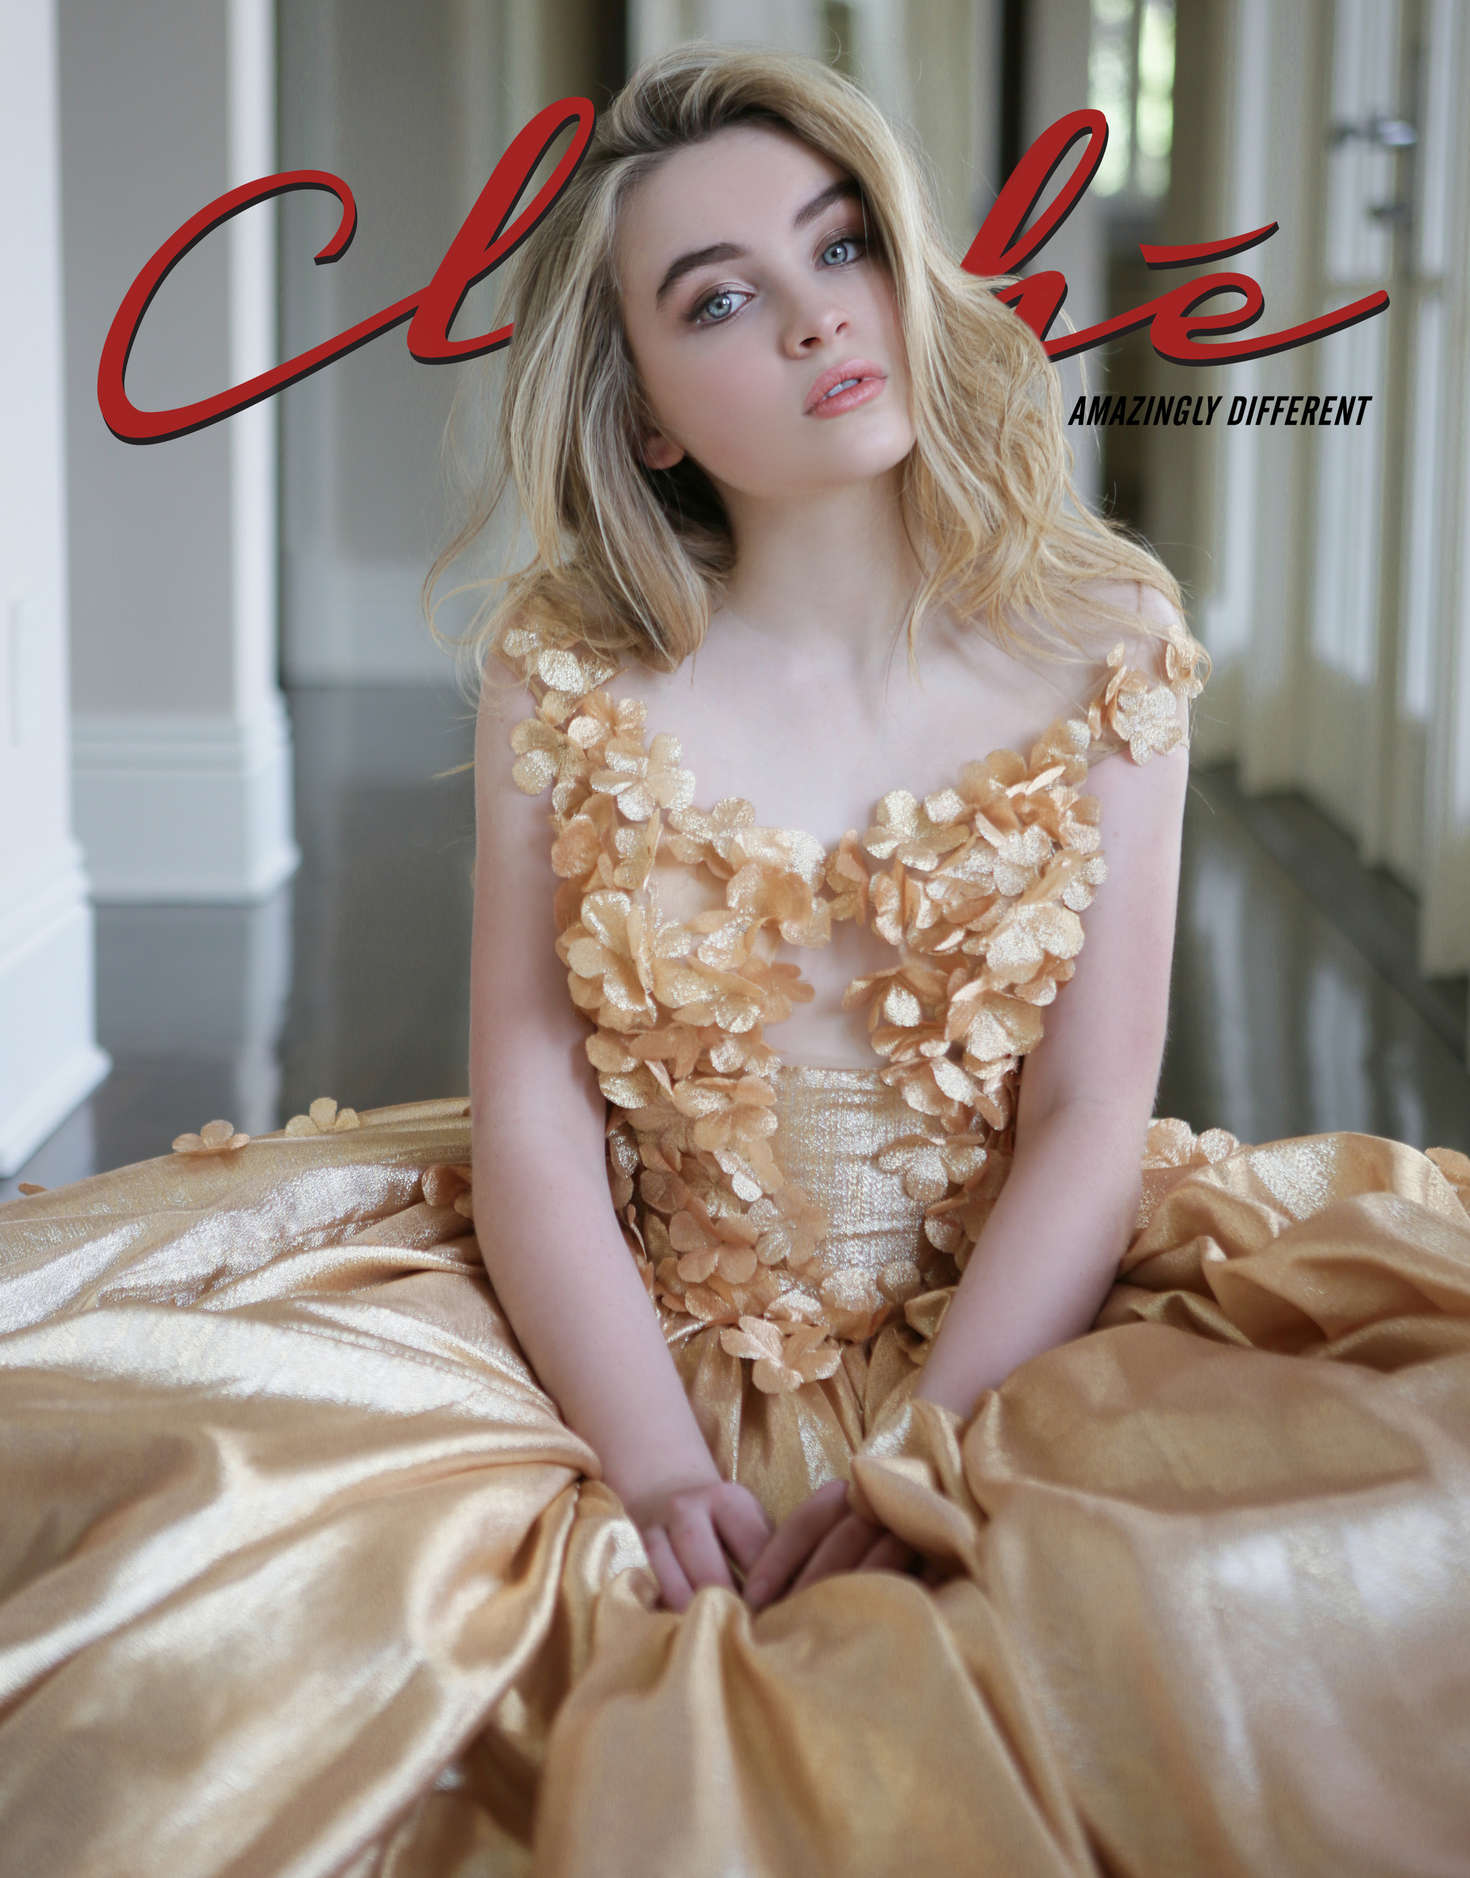 Sabrina Carpenter - Cliche Magazine (Dec/Jan 2015/2016)